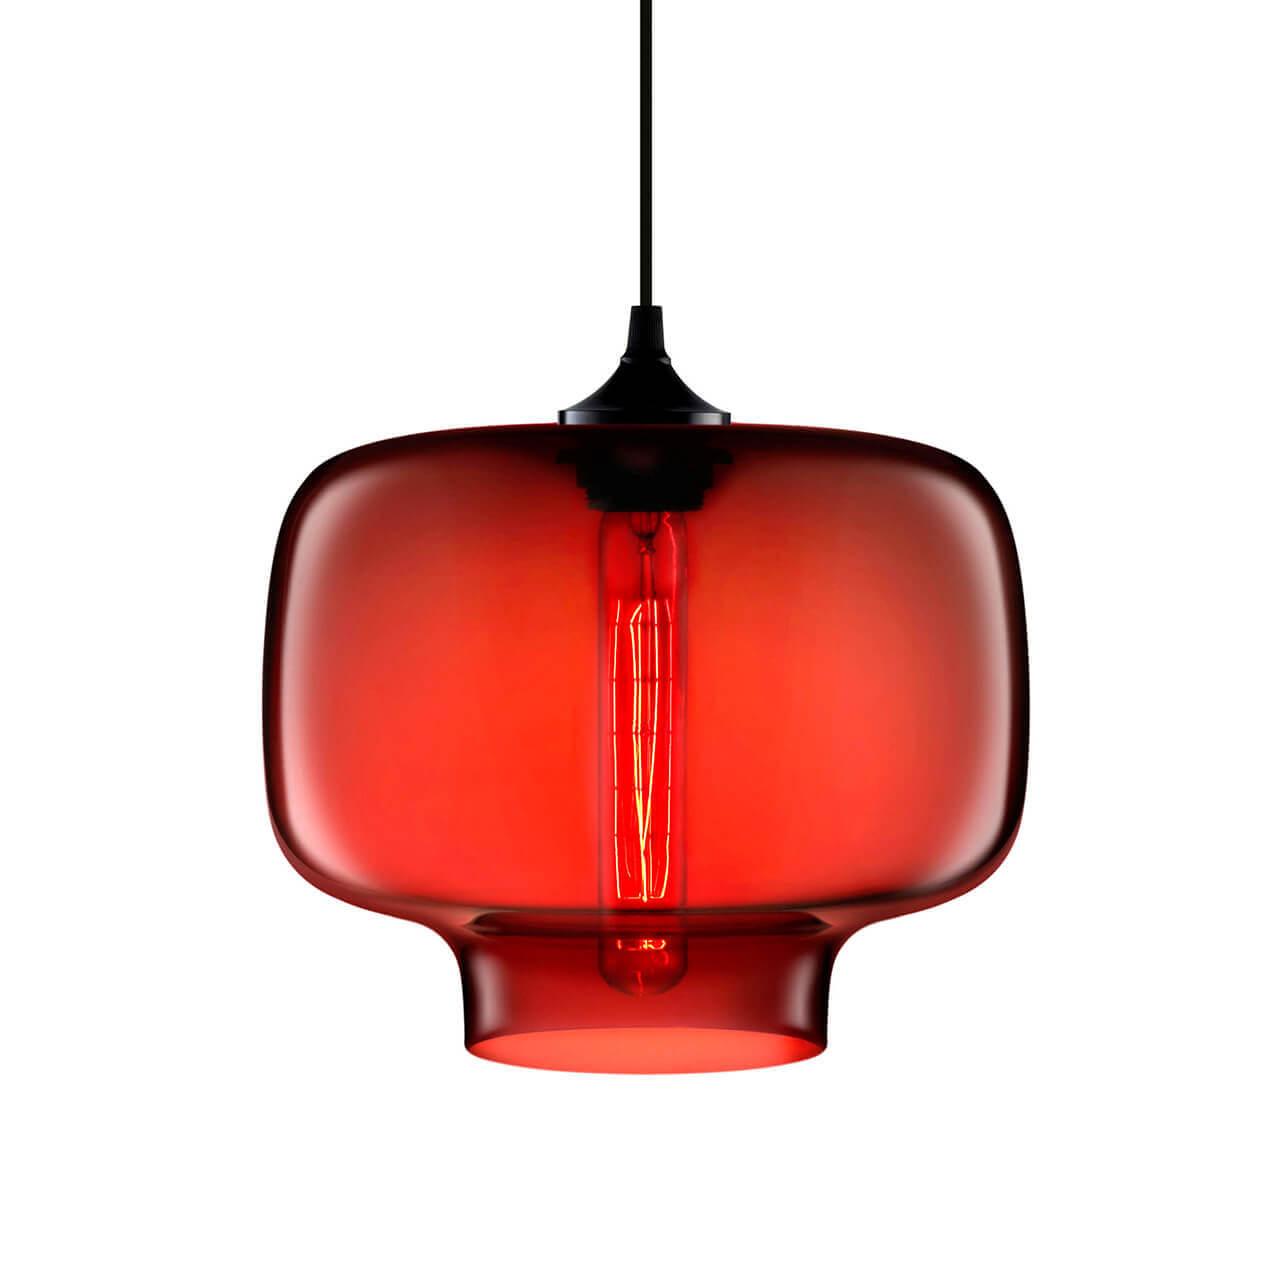 Светильник Artpole 005586 Dampf подвесной светильник artpole mondstein 001110